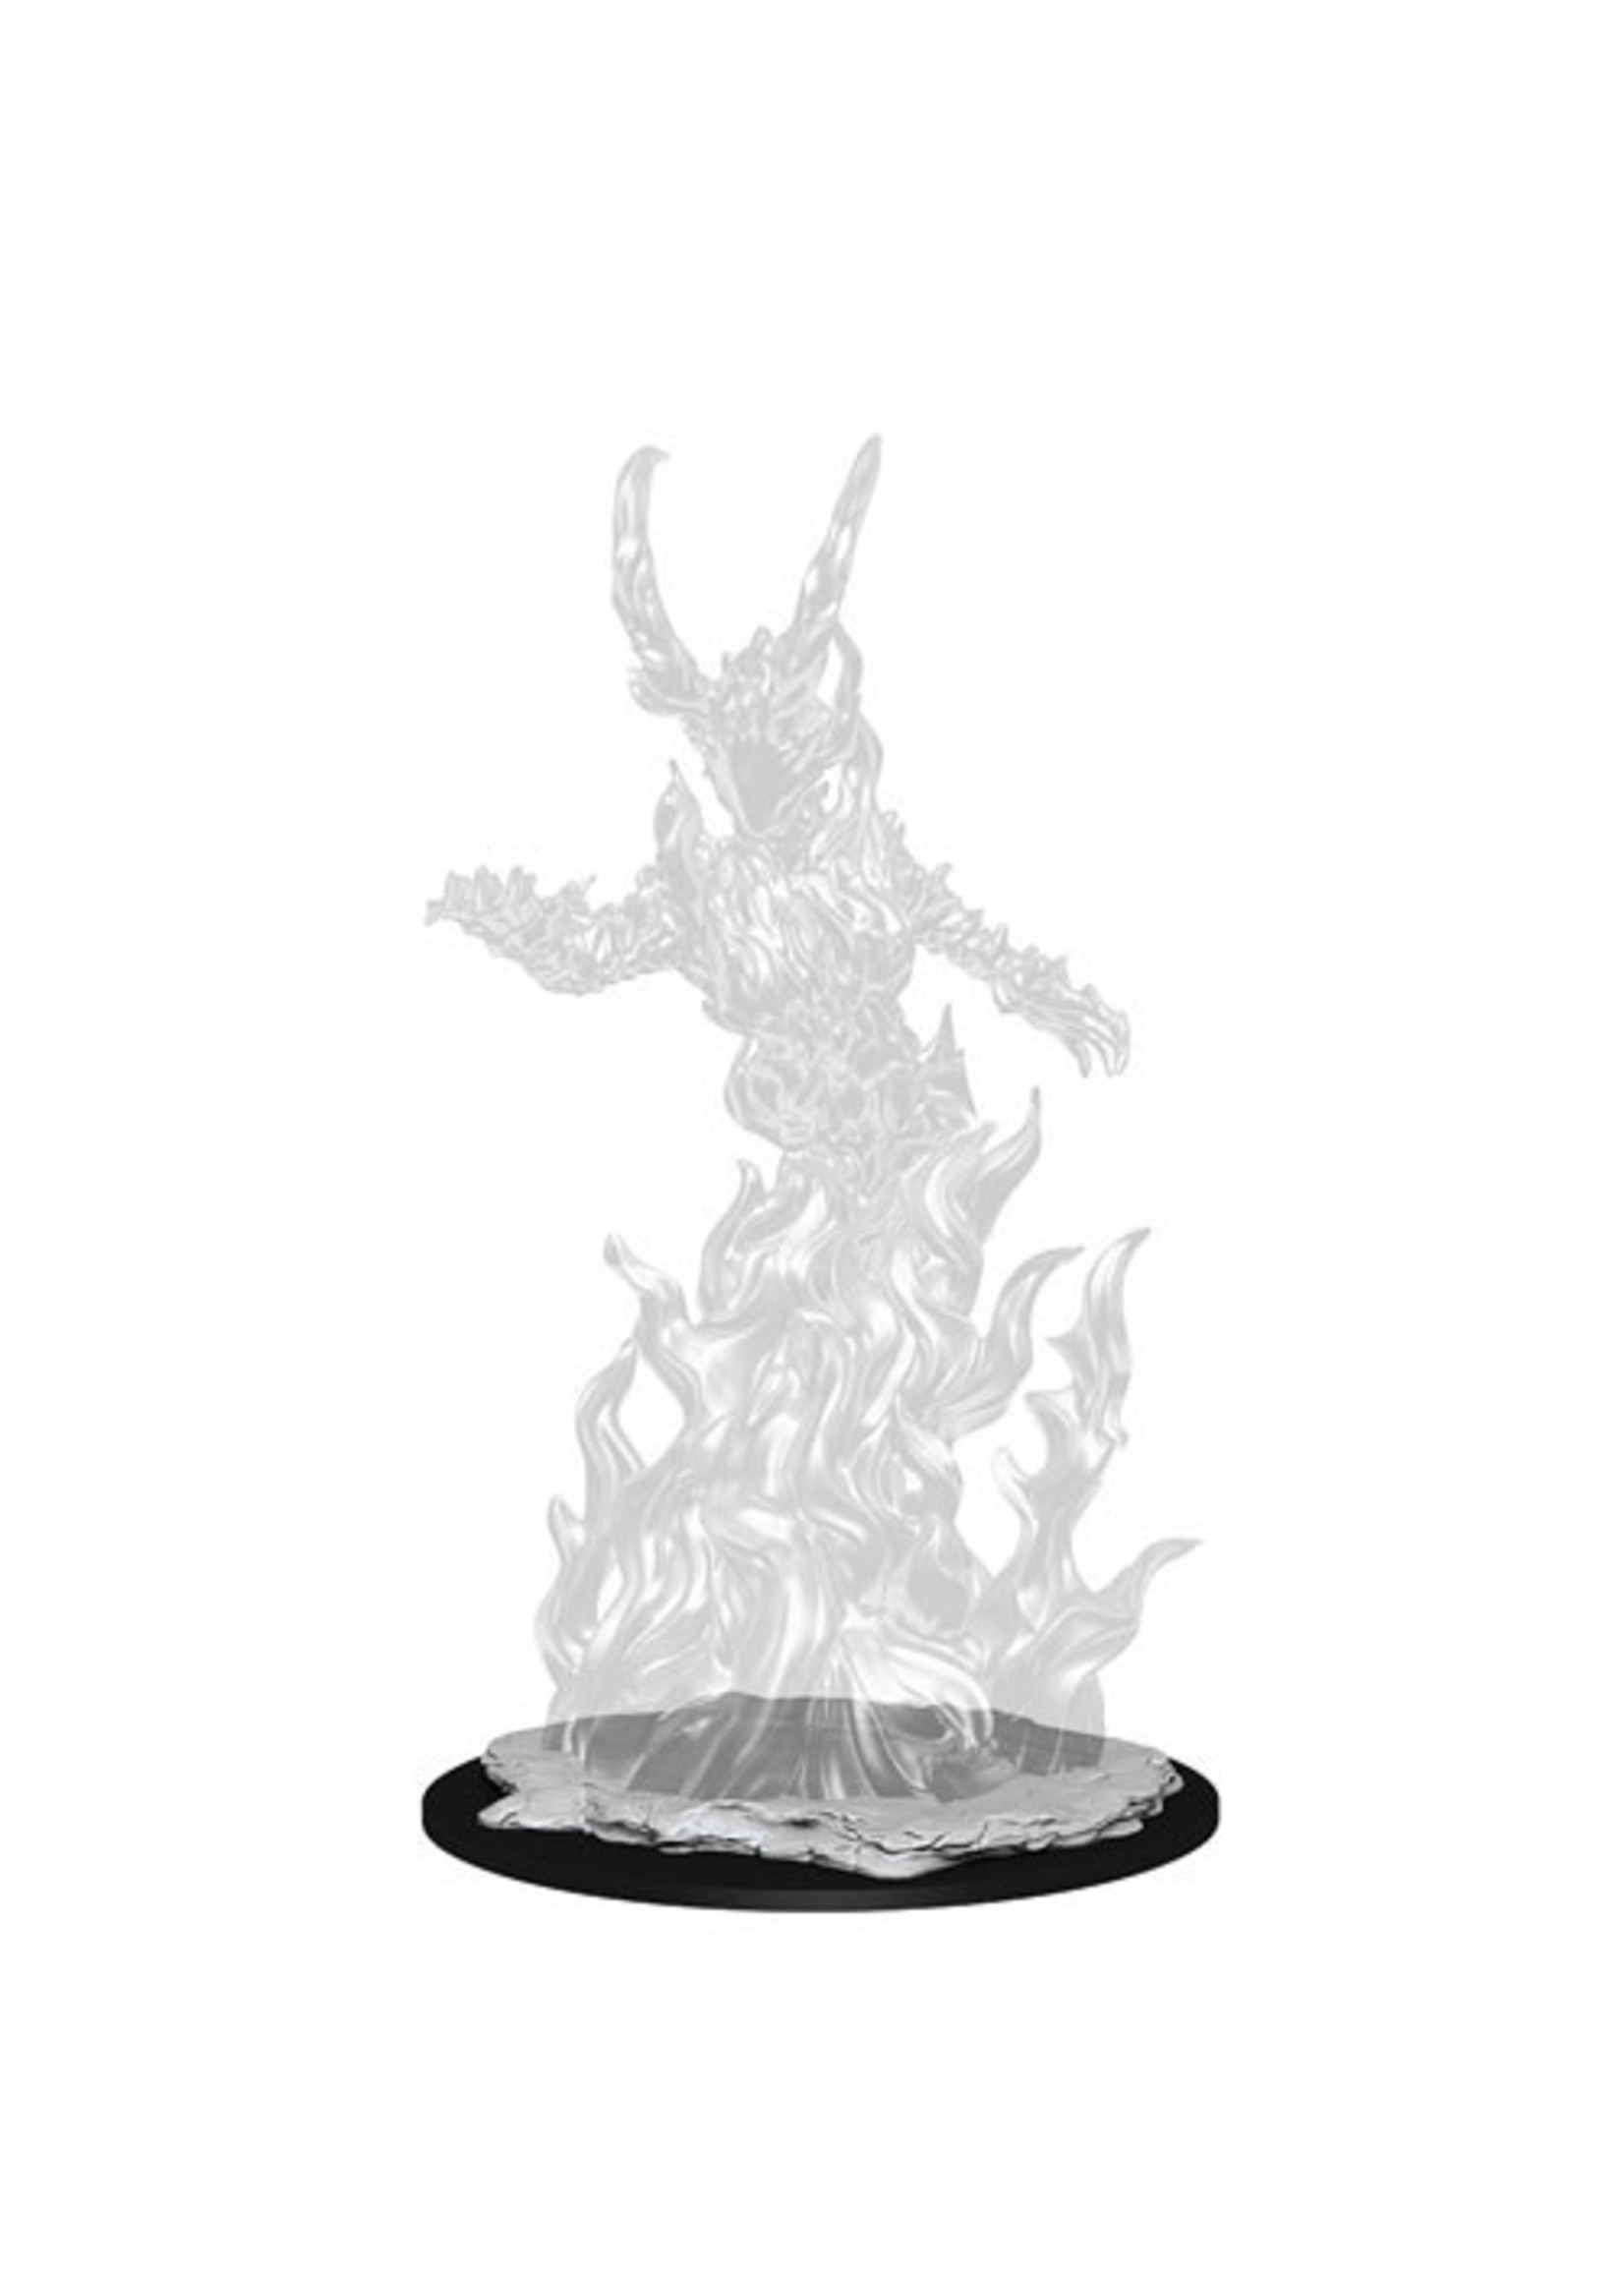 Pathfinder Deep Cuts Unpainted Miniatures: W13 Huge Fire Elemental Lord